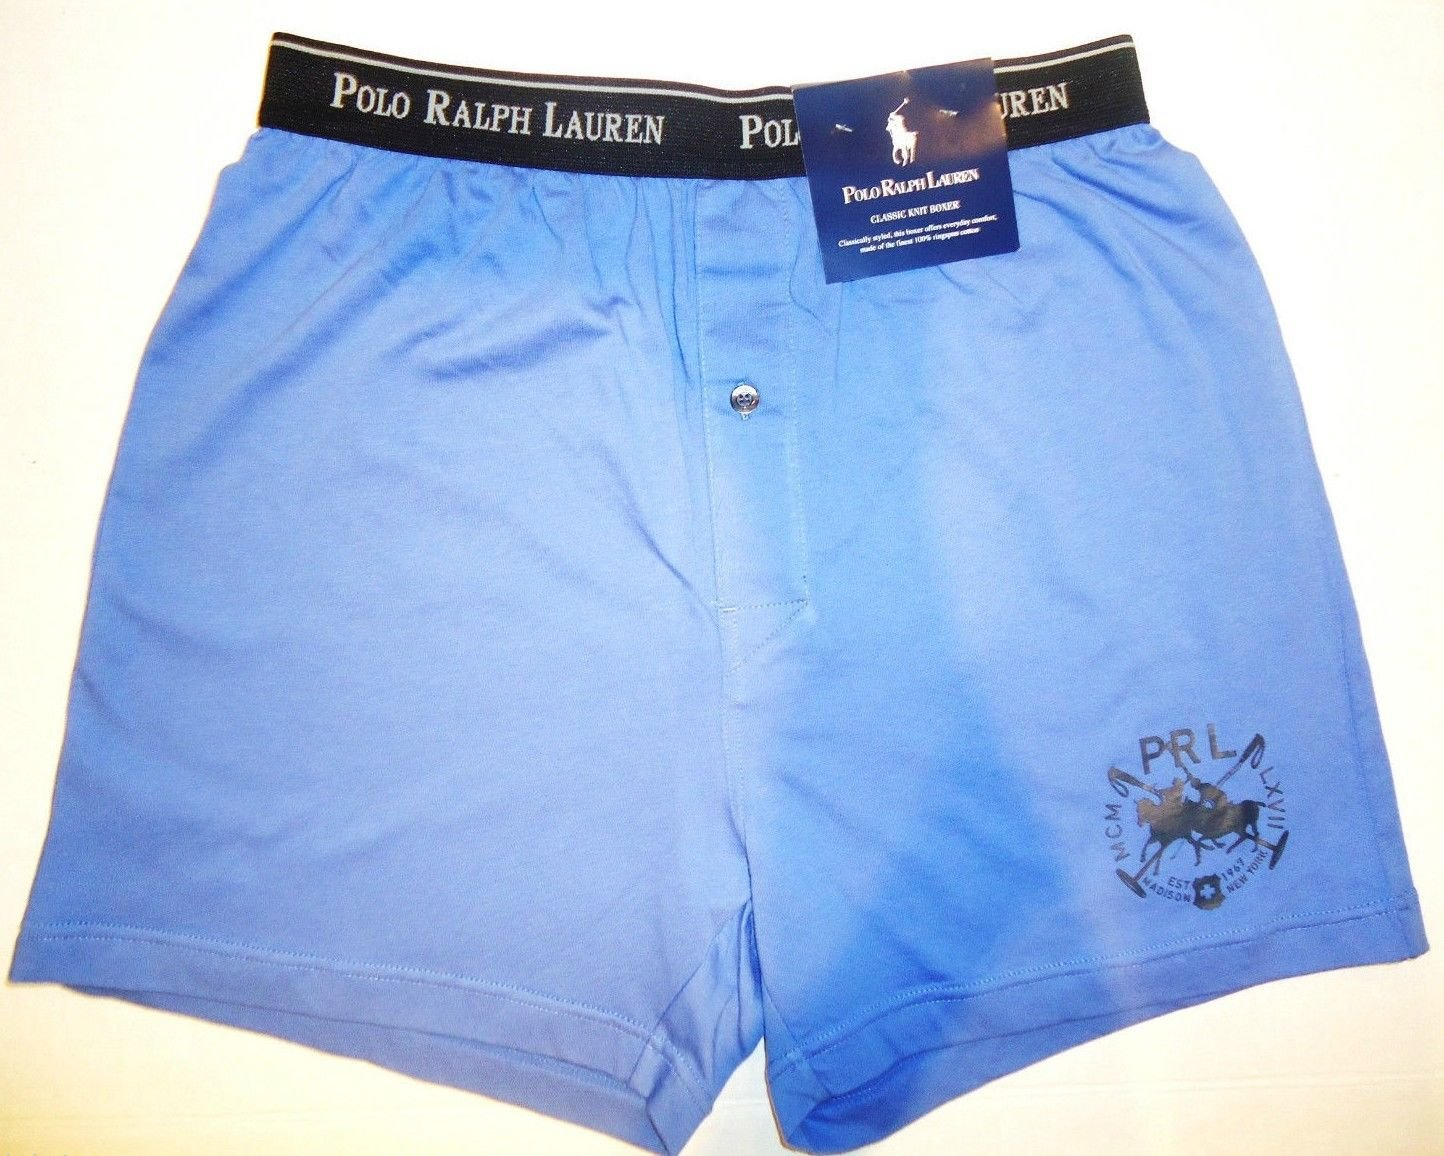 RALPH LAUREN - POLO - BLUE - CLASSIC - KNIT - BOXER - NEW - UNDERWEAR - S - RRL